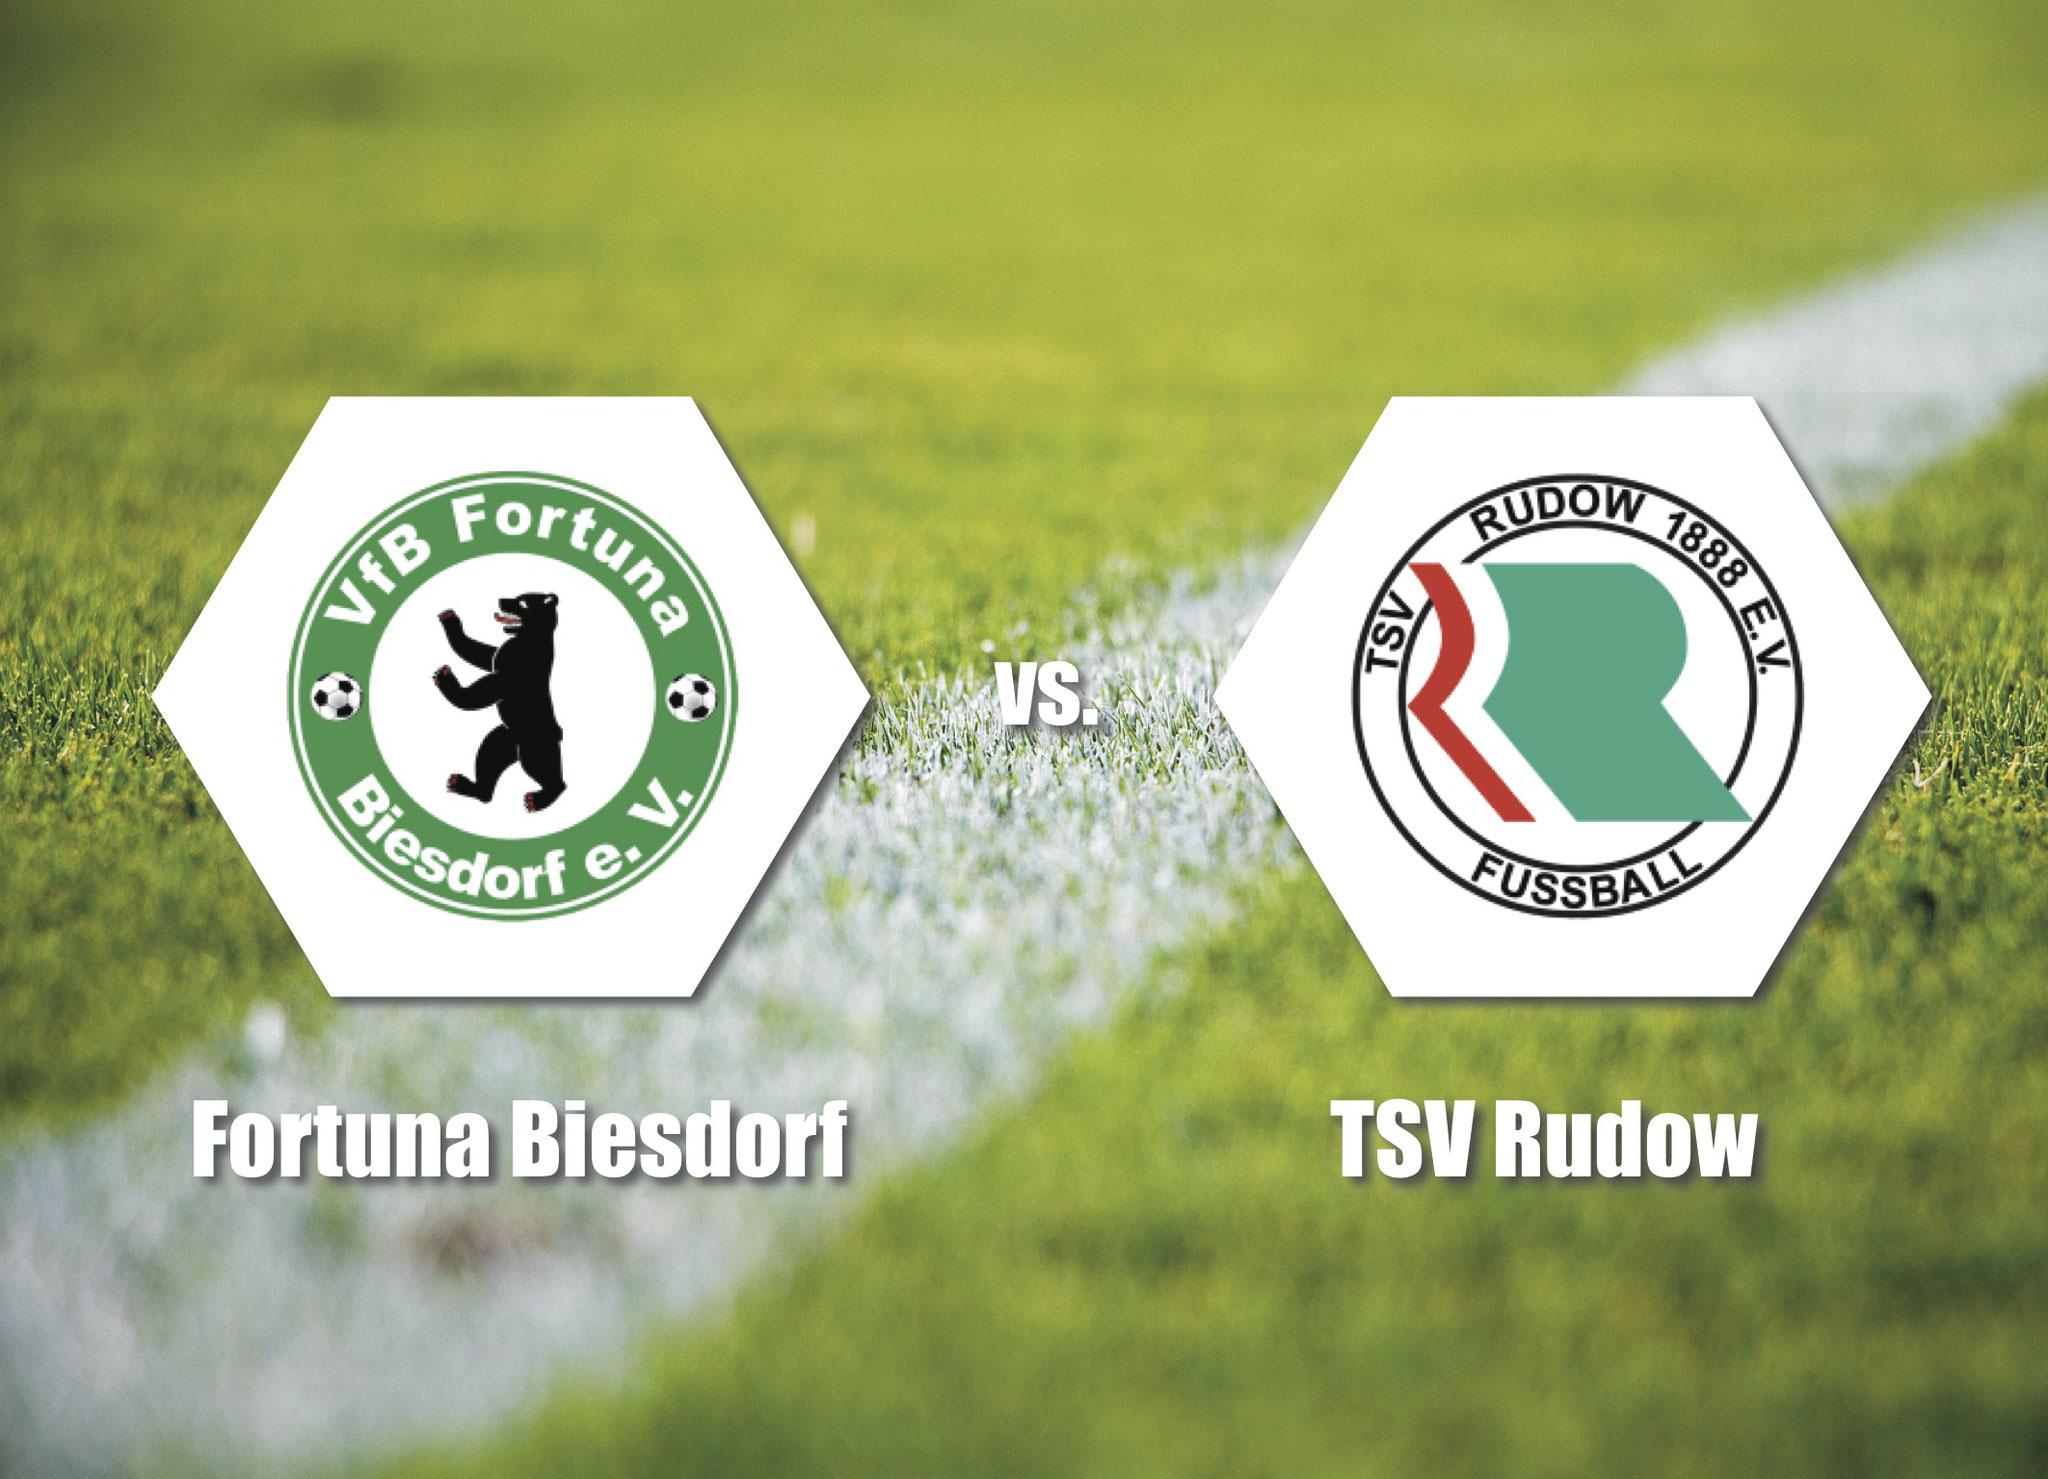 Tipp 7: Sa, 5.10., 14 Uhr: Matchday in der Berlin-Liga. Fortuna Biesdorf vs. TSV Rudow, Grabensprung 56